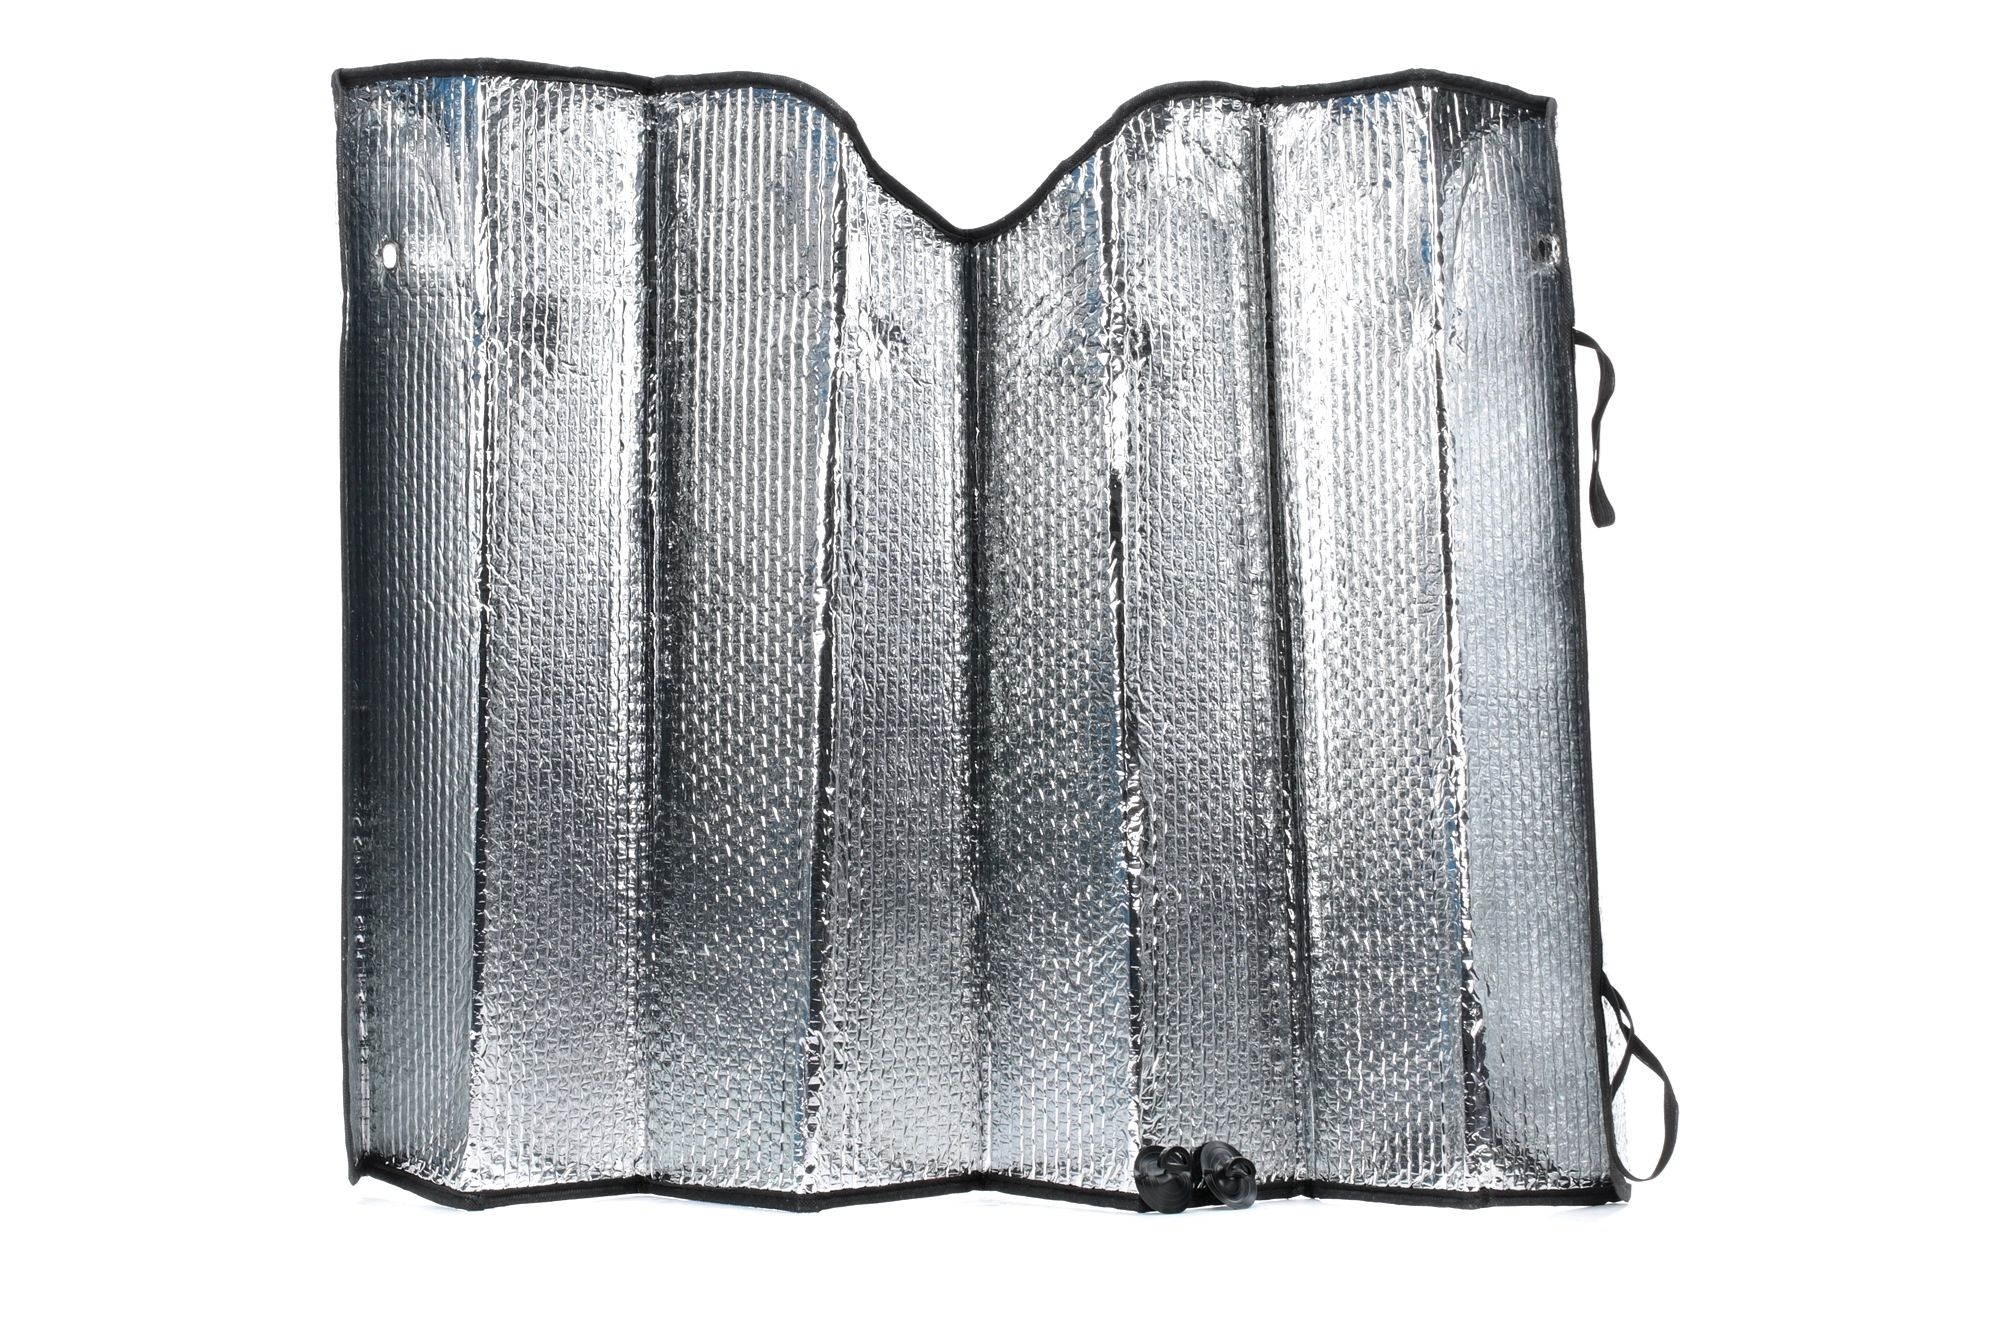 Folie de protecţie parbriz CARCOMMERCE 42884 nota